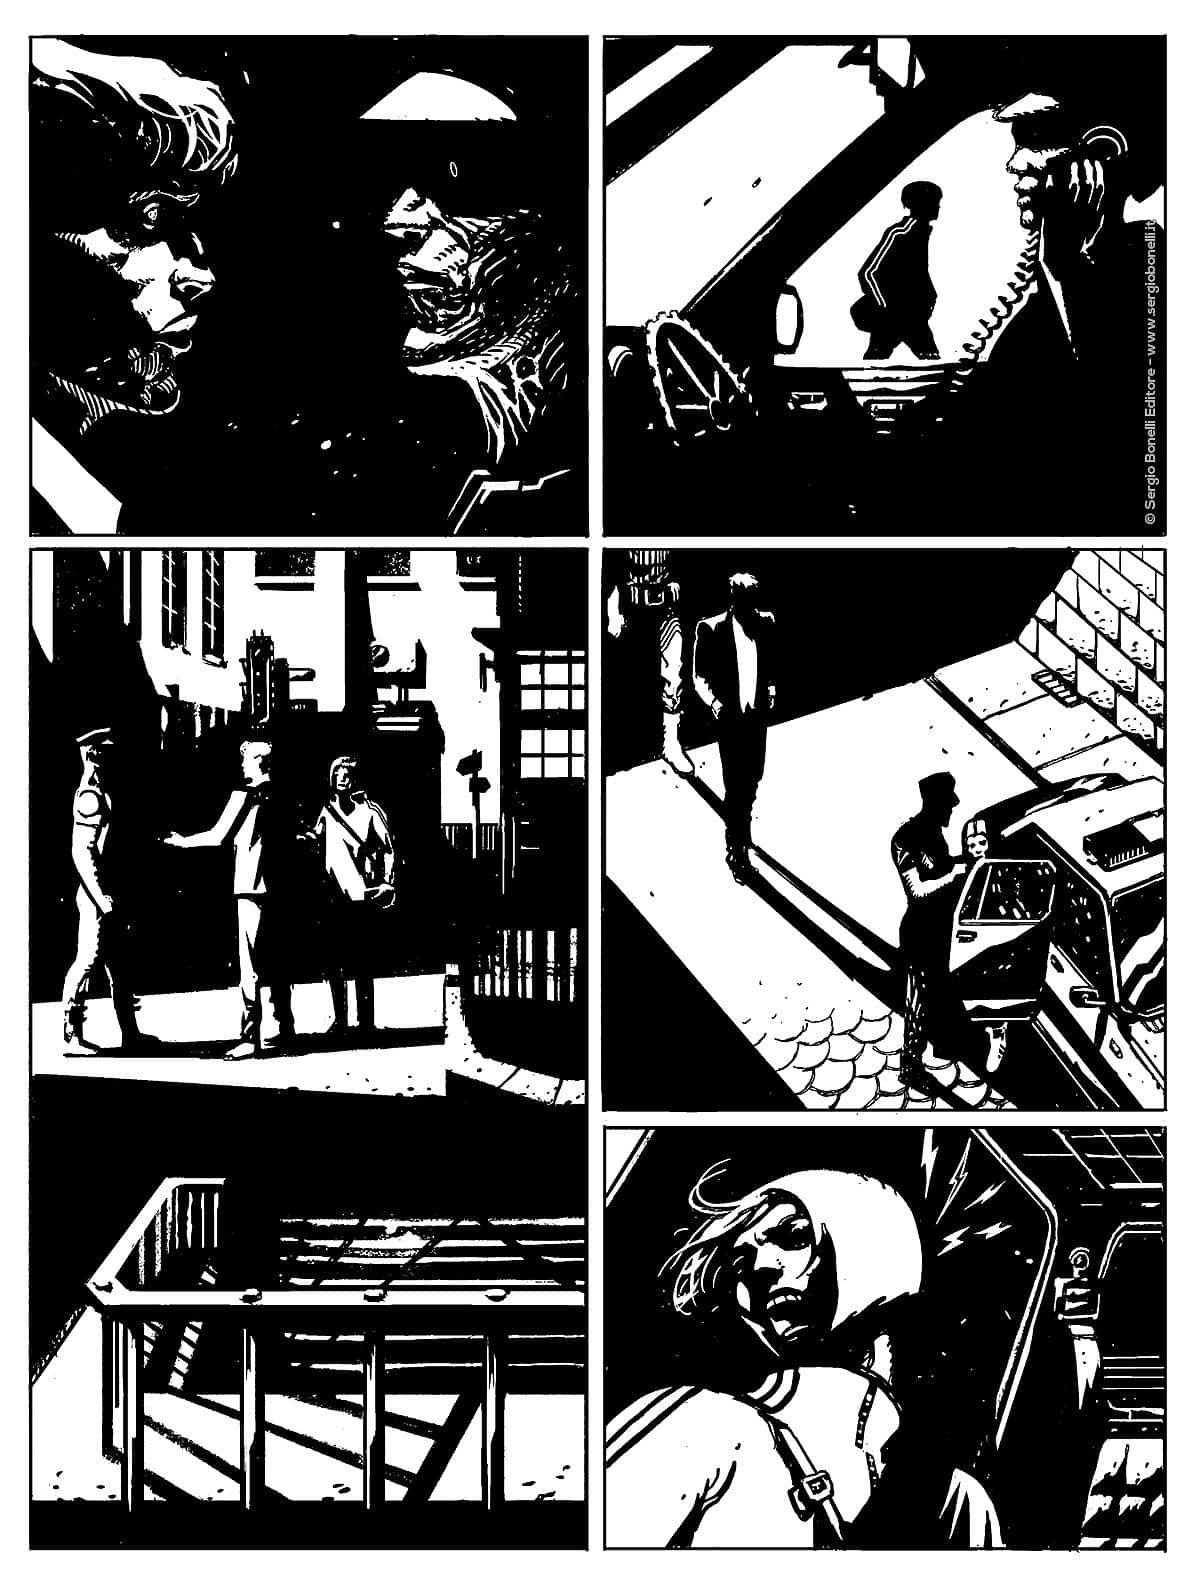 Dylan Dog 416, di Uzzeo e Lauria